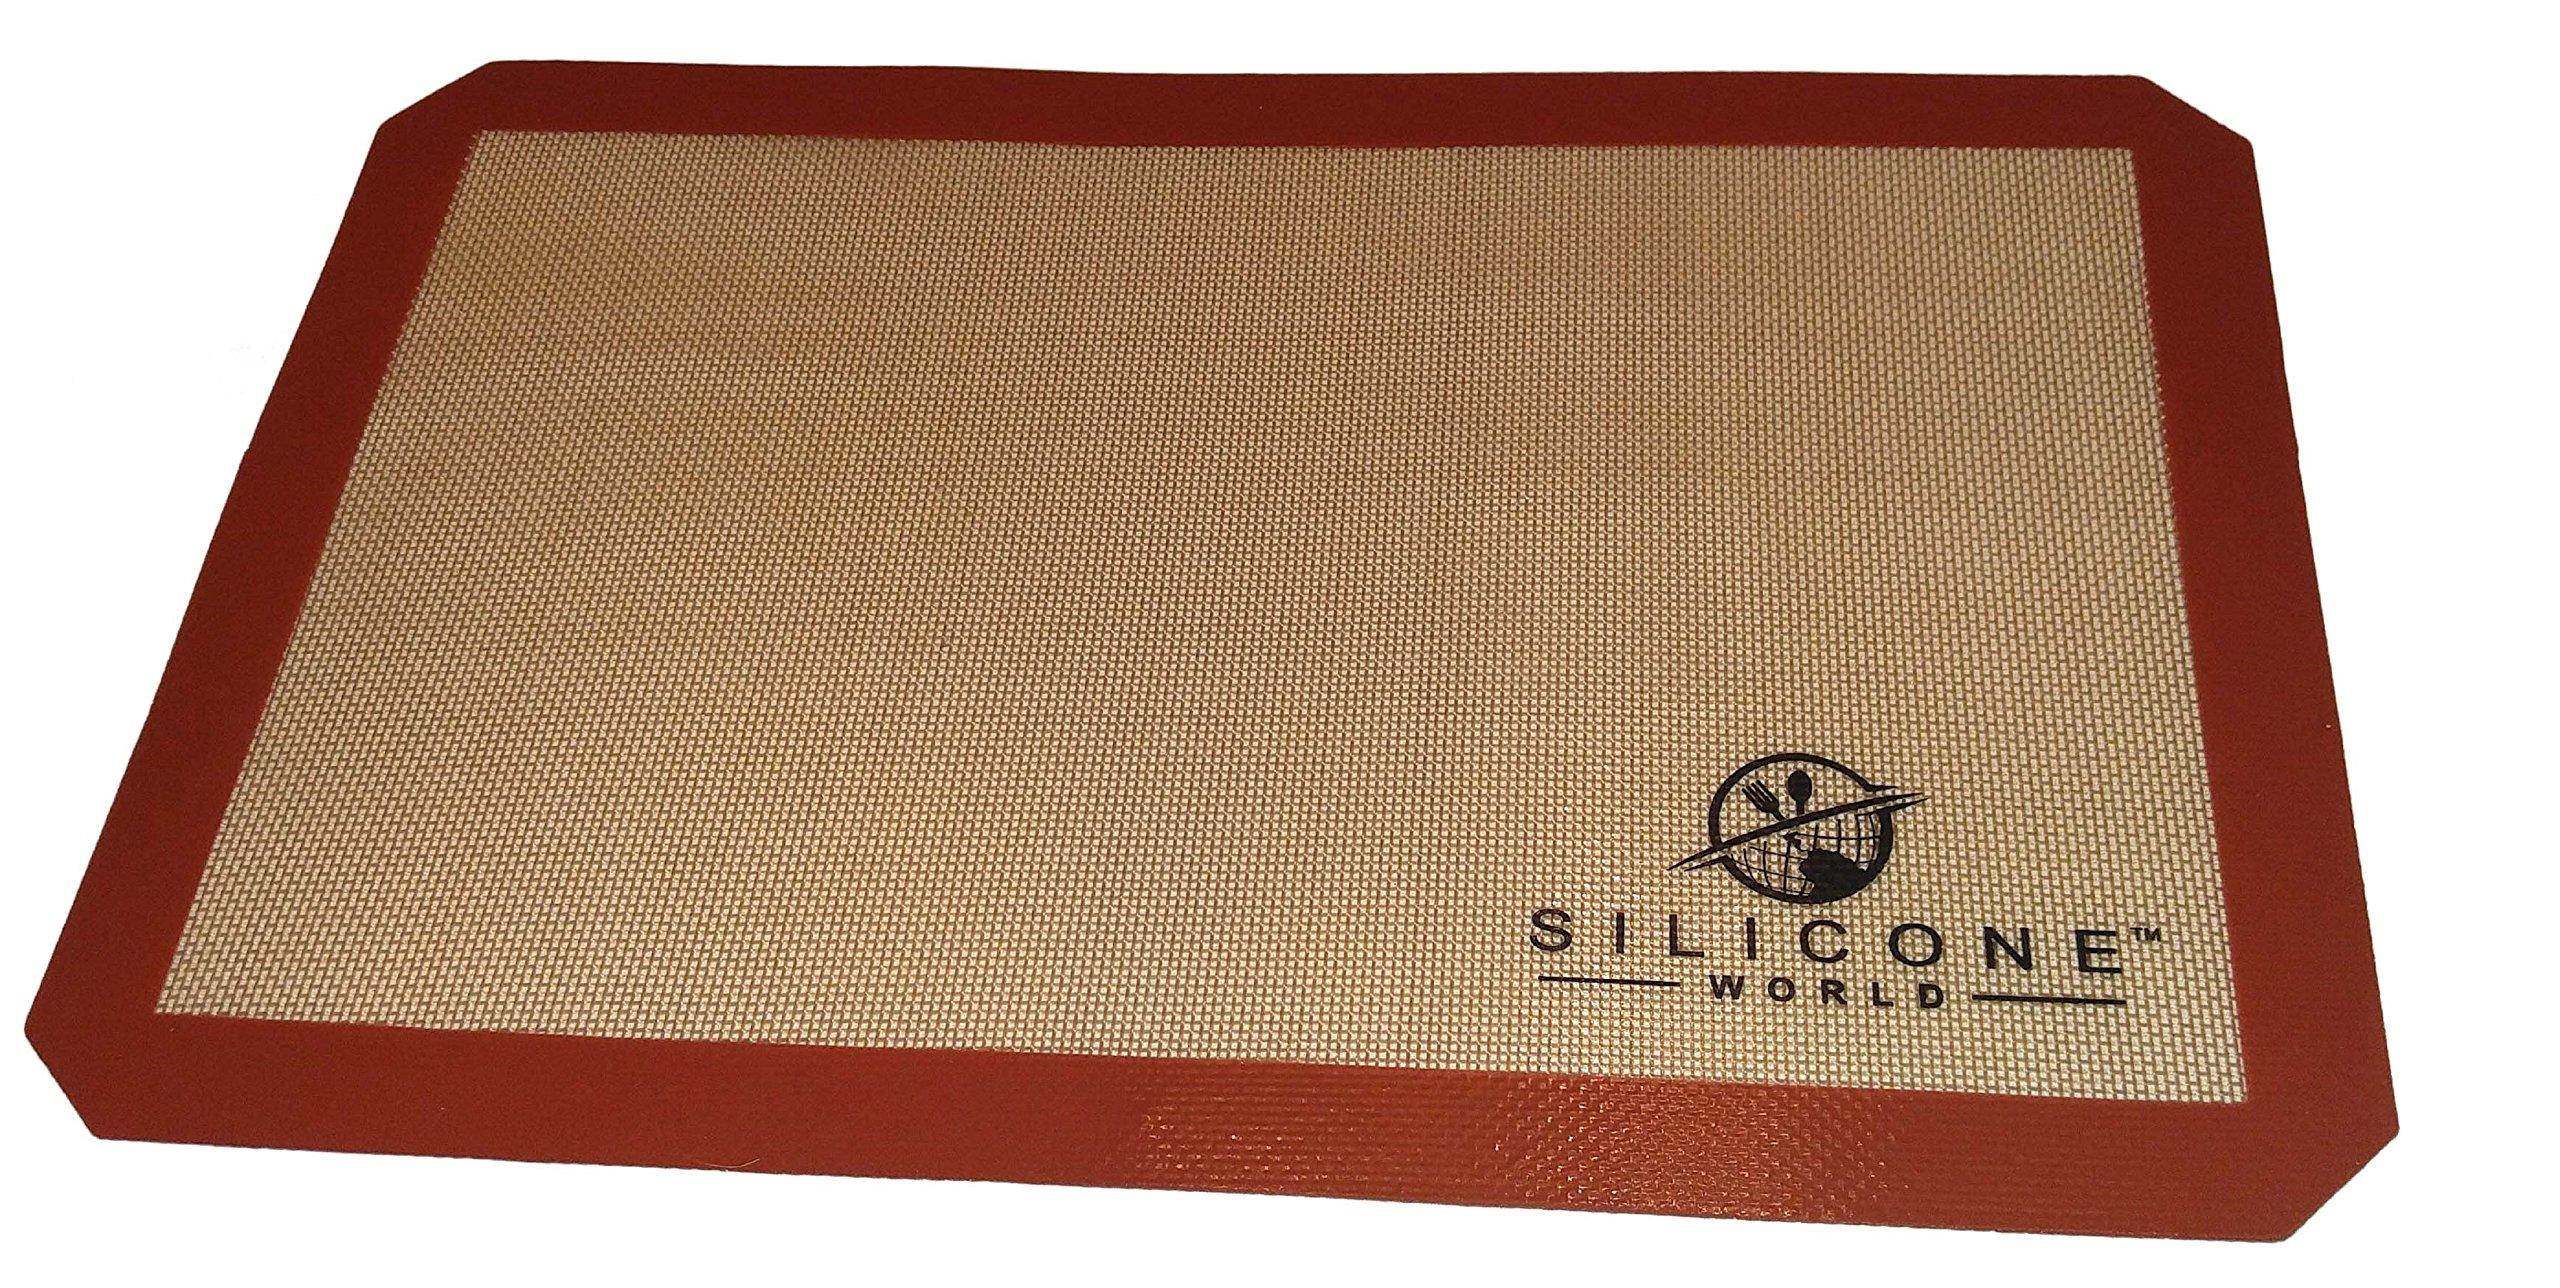 "Silicone World - Professional Grade Silicone Baking Mat - Incredible Reusable 1 Piece, Durable, Non-stick Fiberglass 11-5/8"" X 16-1/2"""